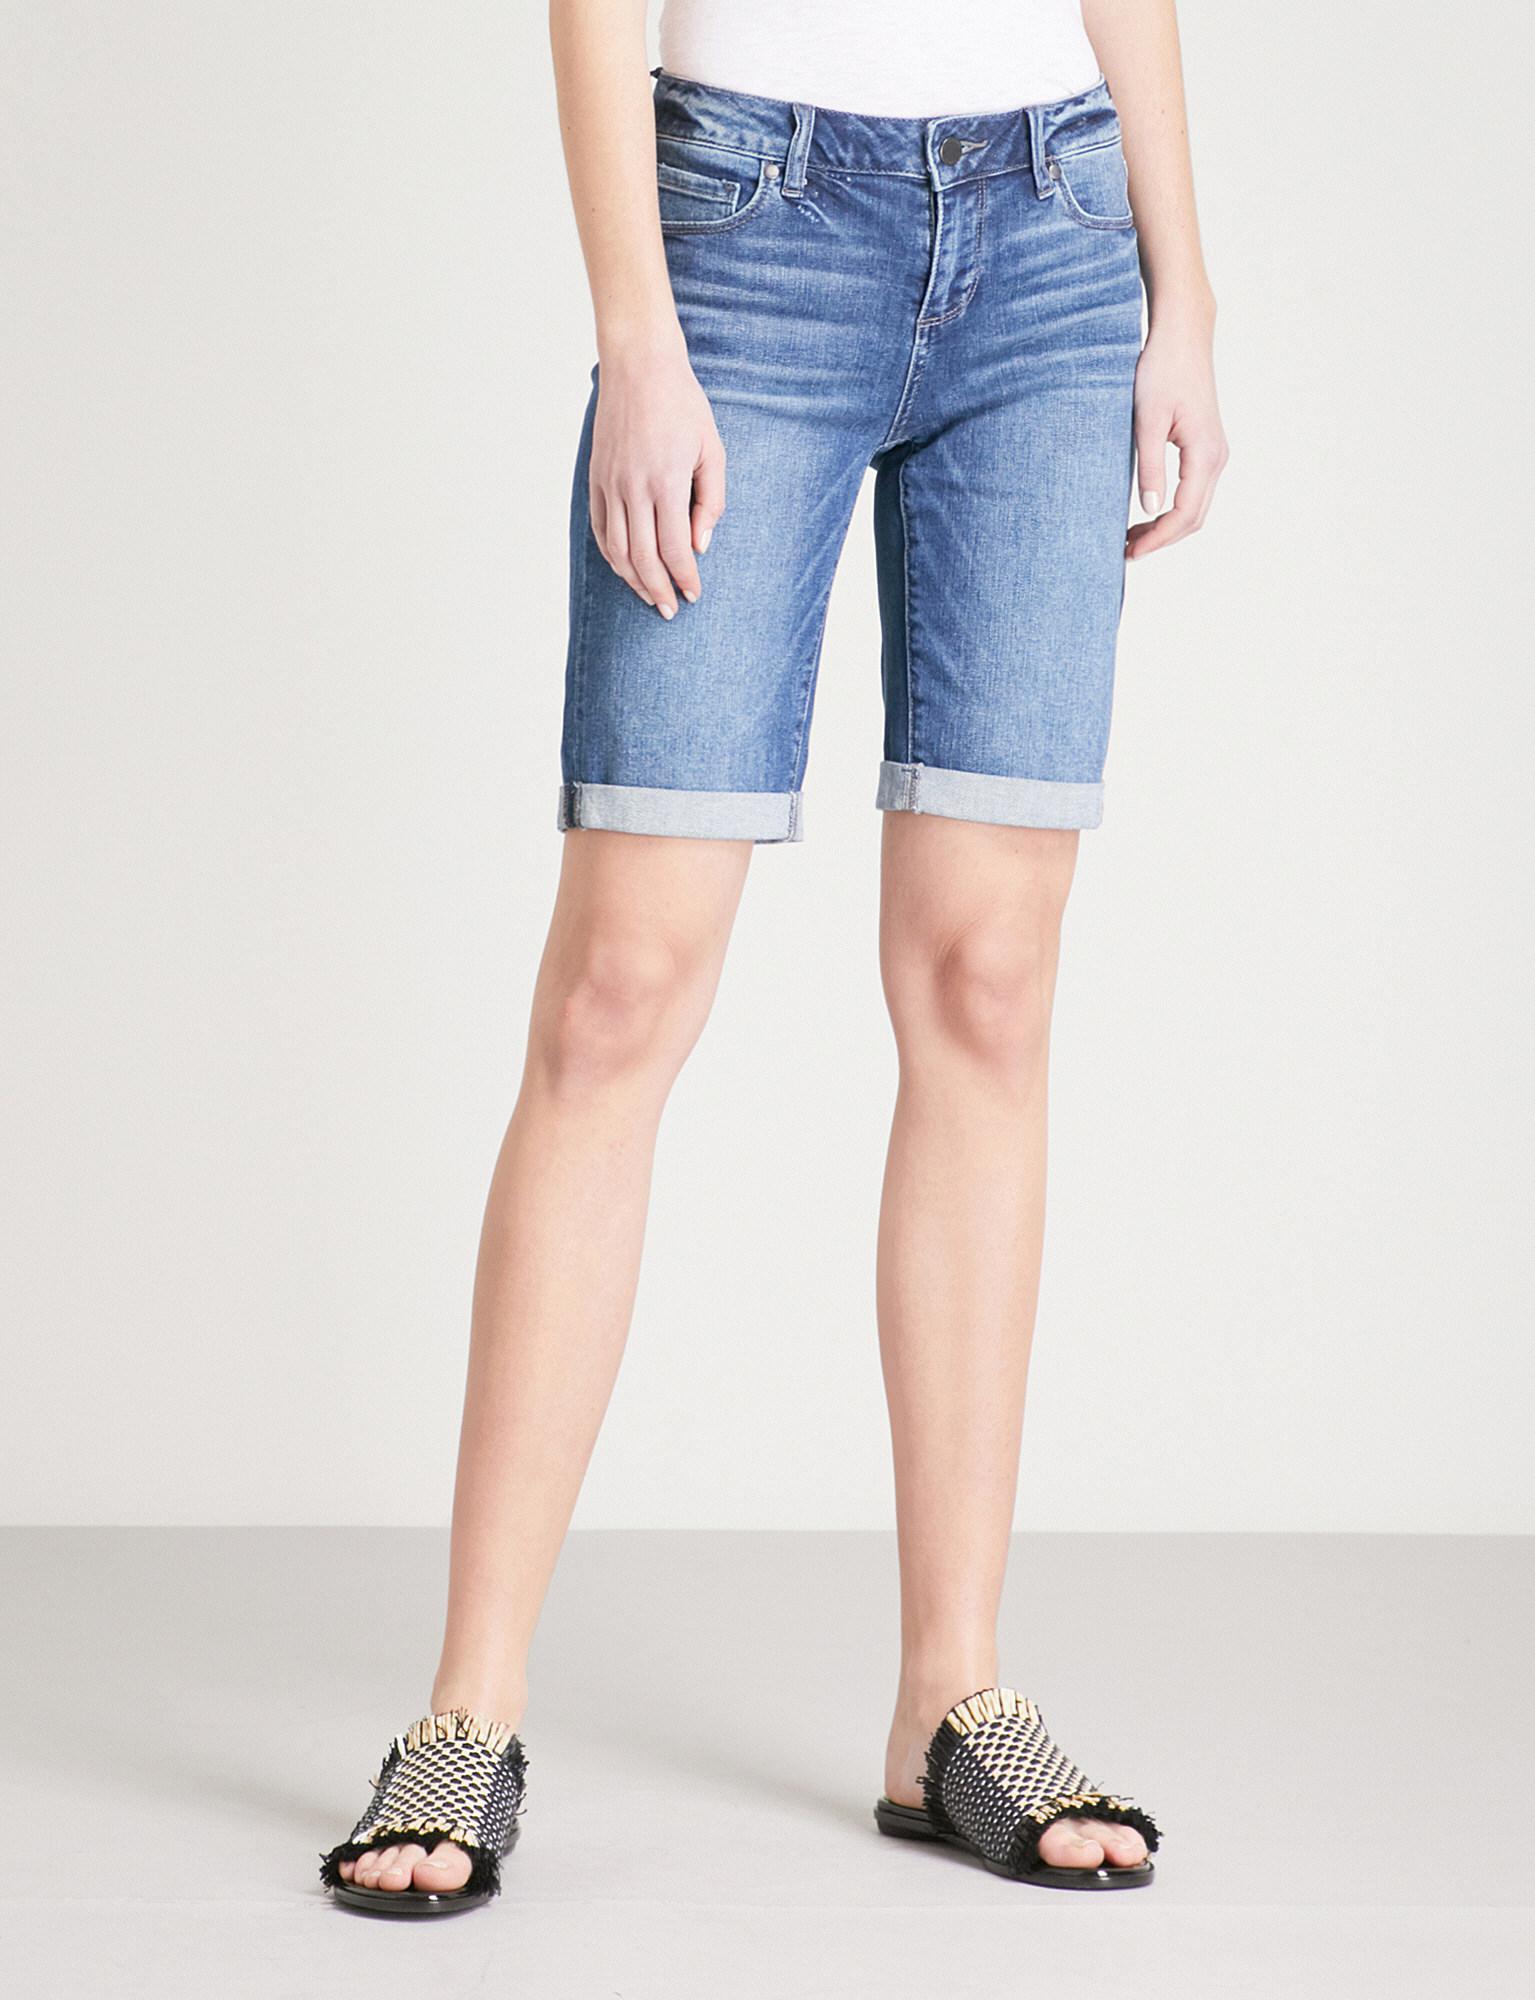 89e1b0c21df95 PAIGE Jax Slim-fit Stretch-denim Shorts in Blue - Lyst